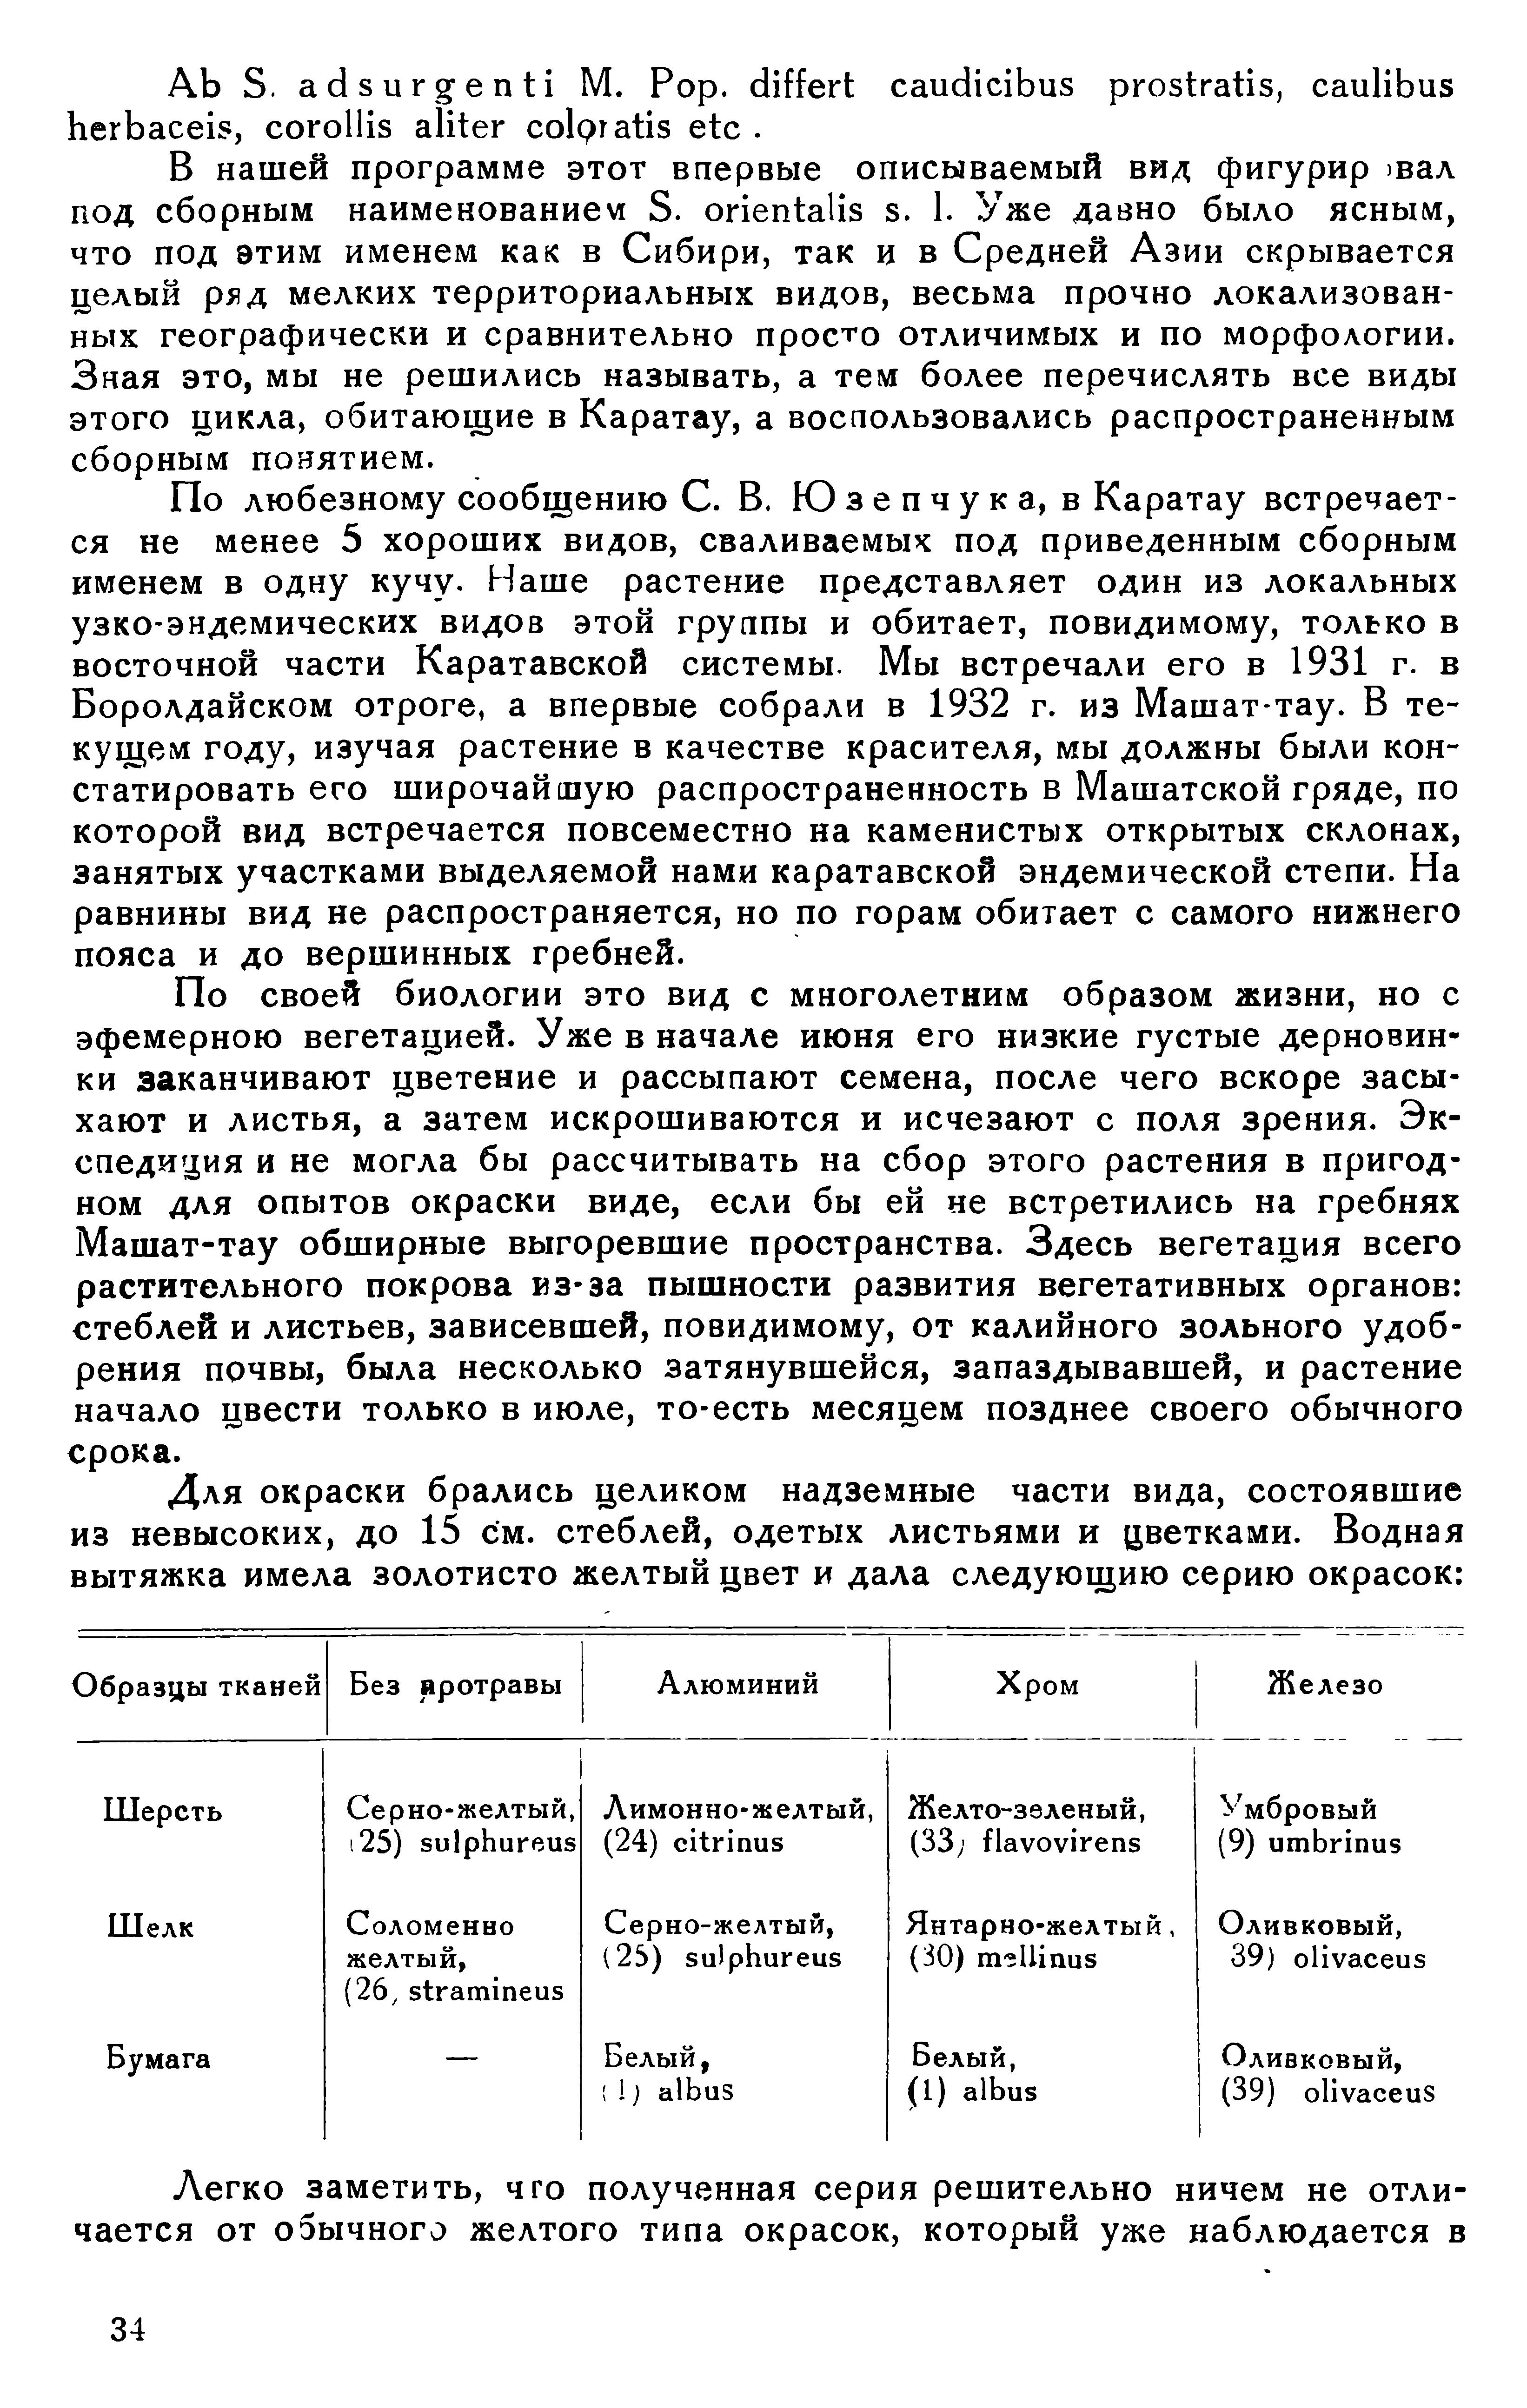 https://forum.plantarium.ru/misc.php?action=pun_attachment&item=26603&download=0